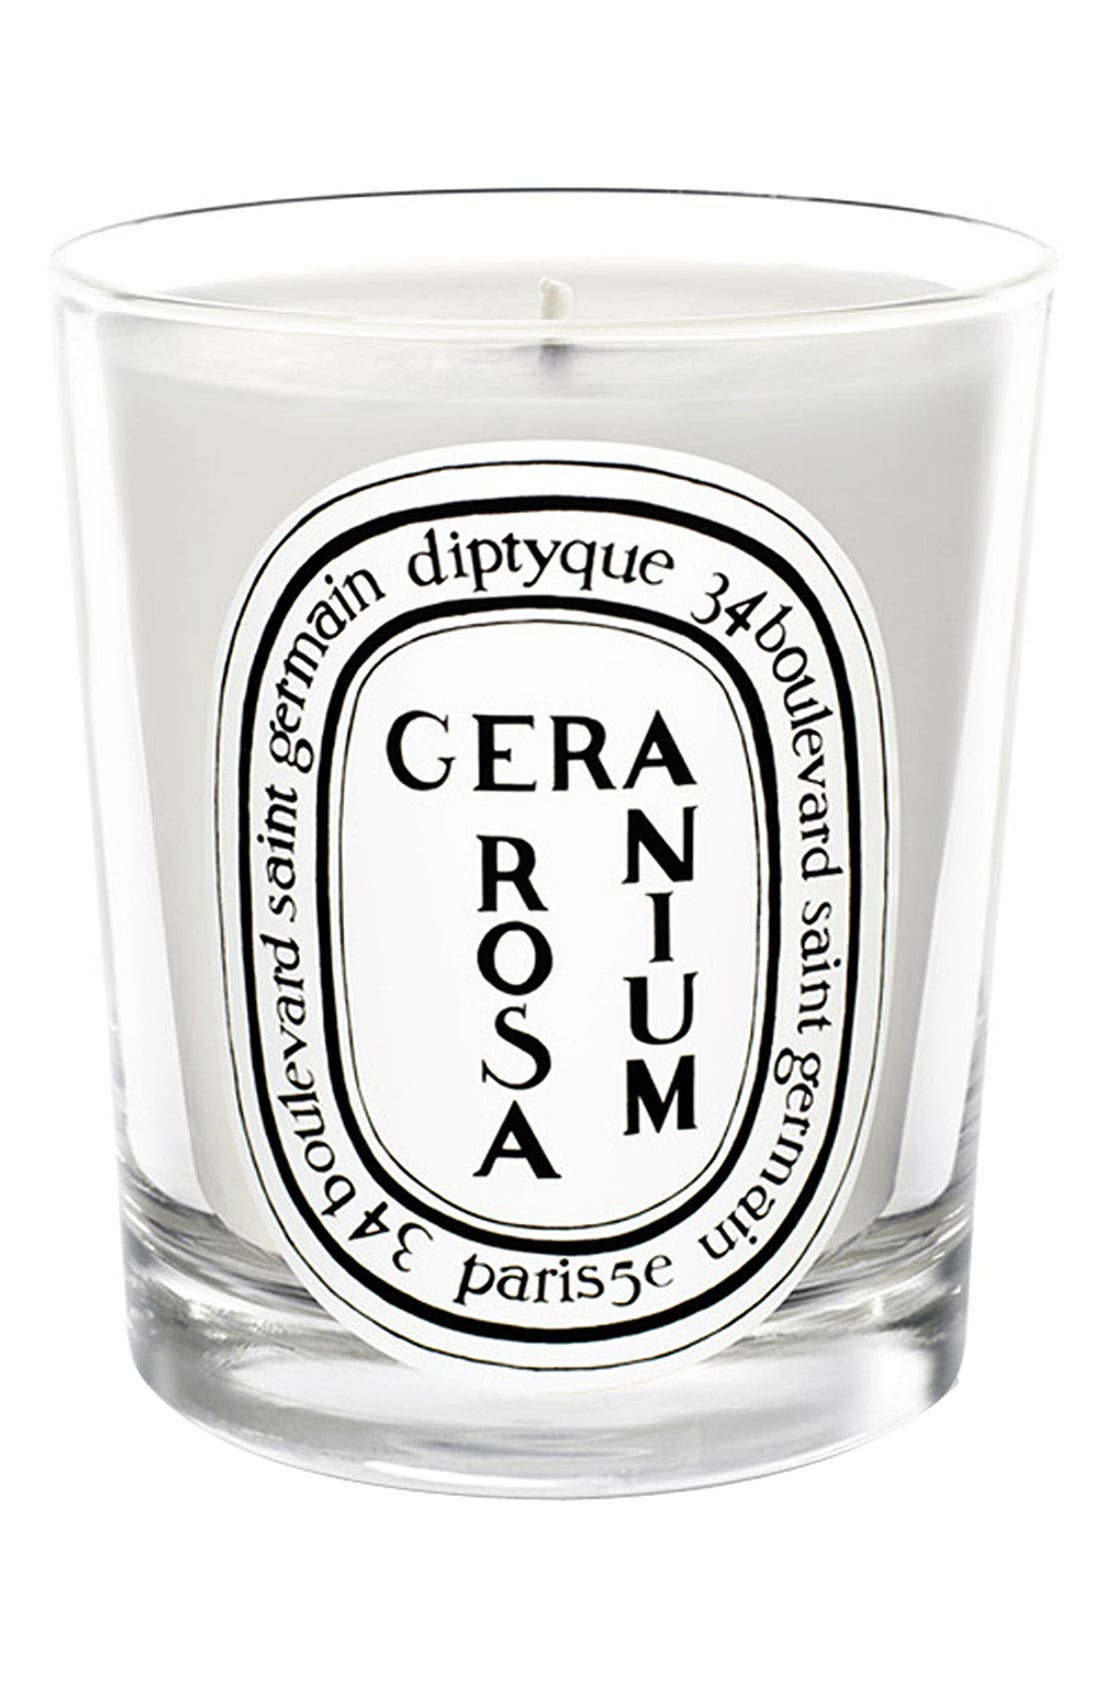 Geranium Rosa/Rose Geranium Scented Candle,                             Main thumbnail 1, color,                             000